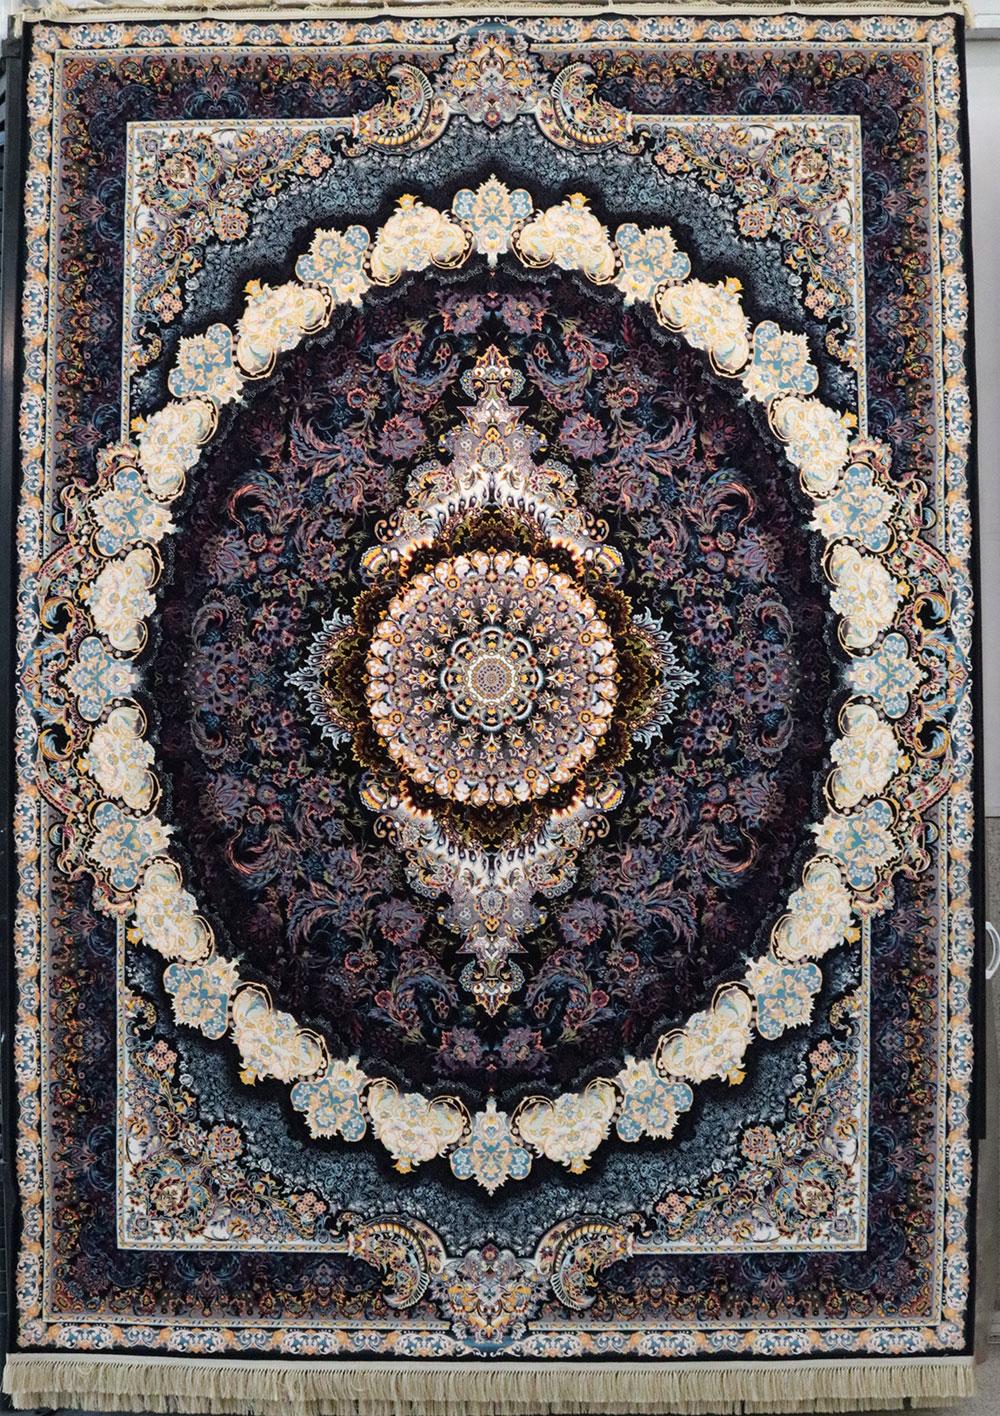 فرش کاشان- نقشه زیگورات 1200 شانه